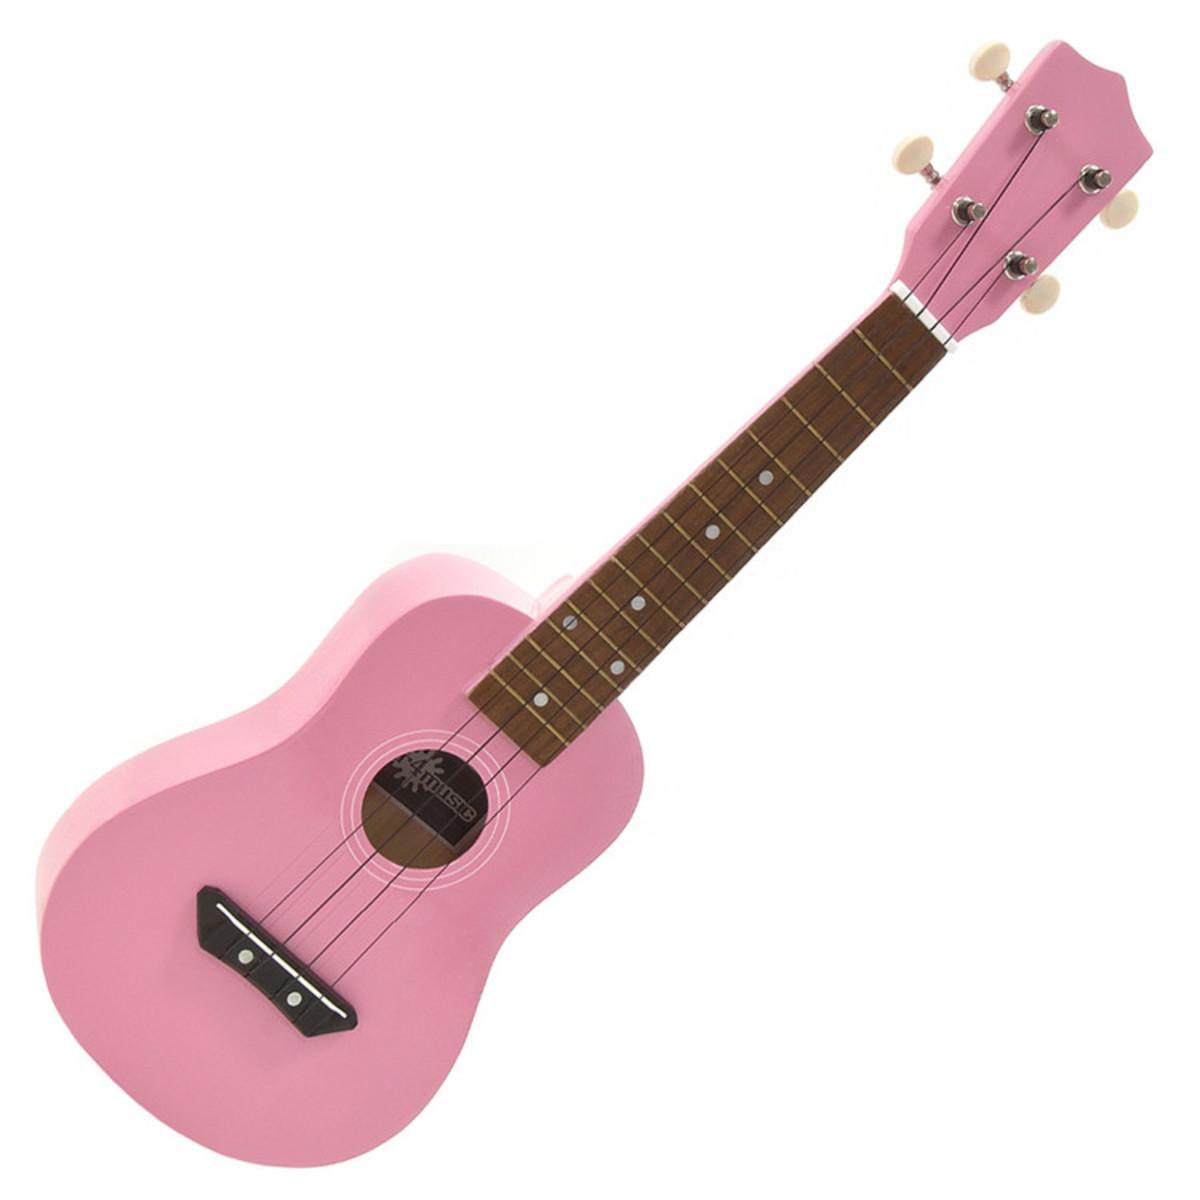 Phd dissertation length ukulele